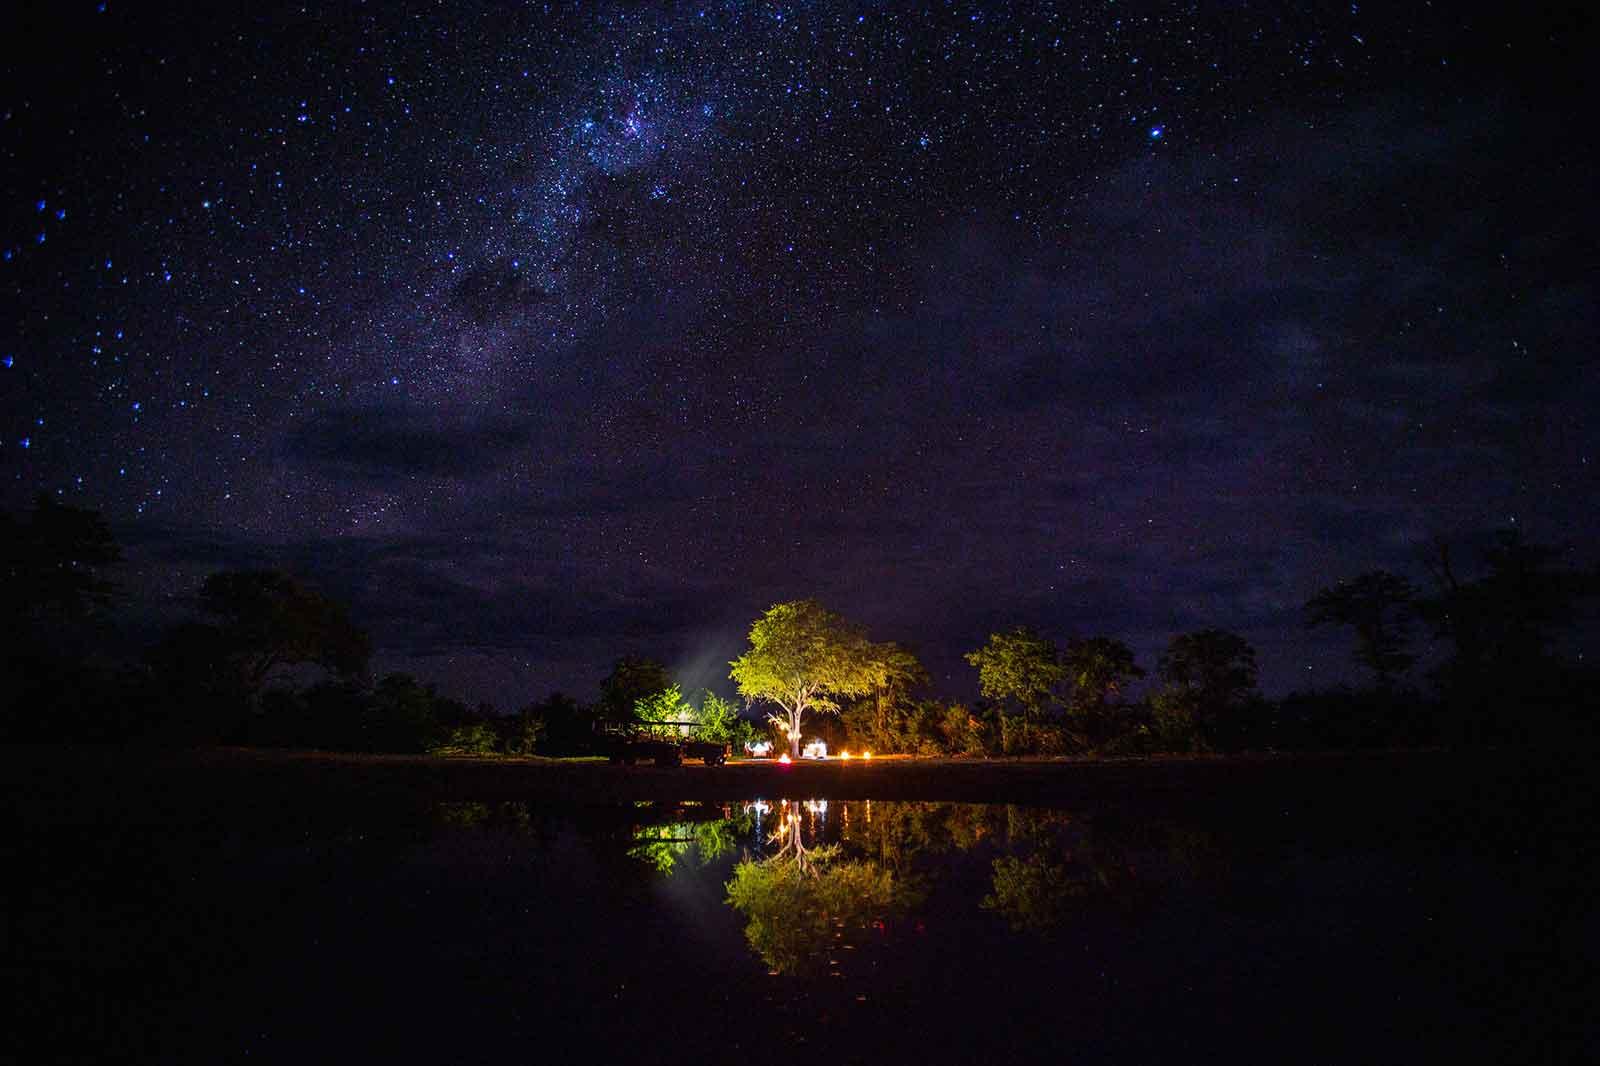 Motswiri Camp Under the Stars